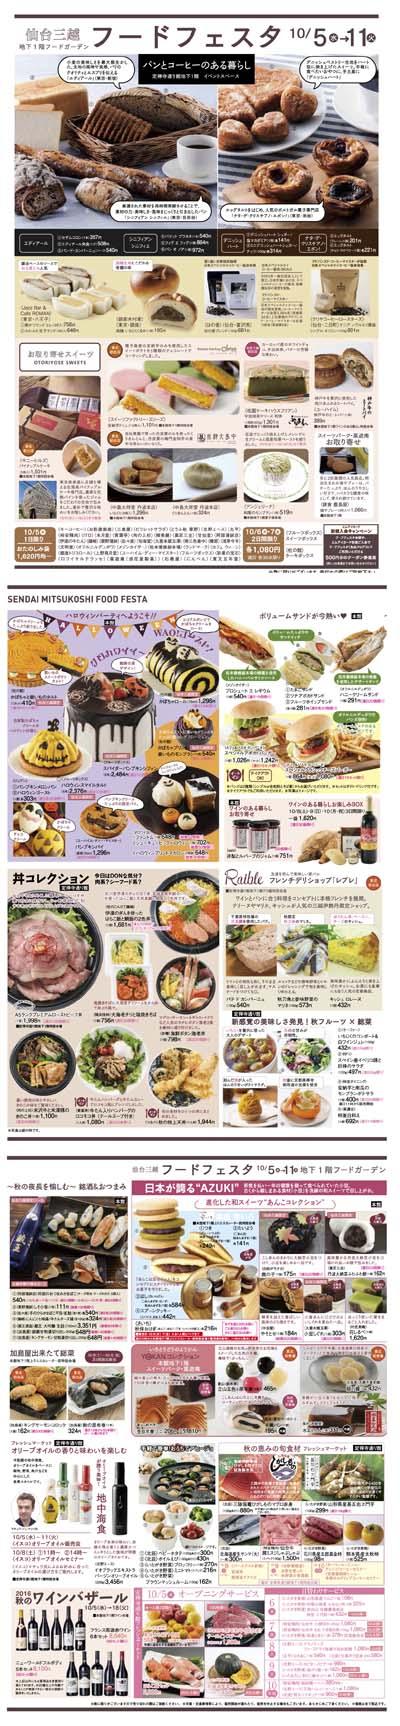 sendai_foodfesta2016d.jpg